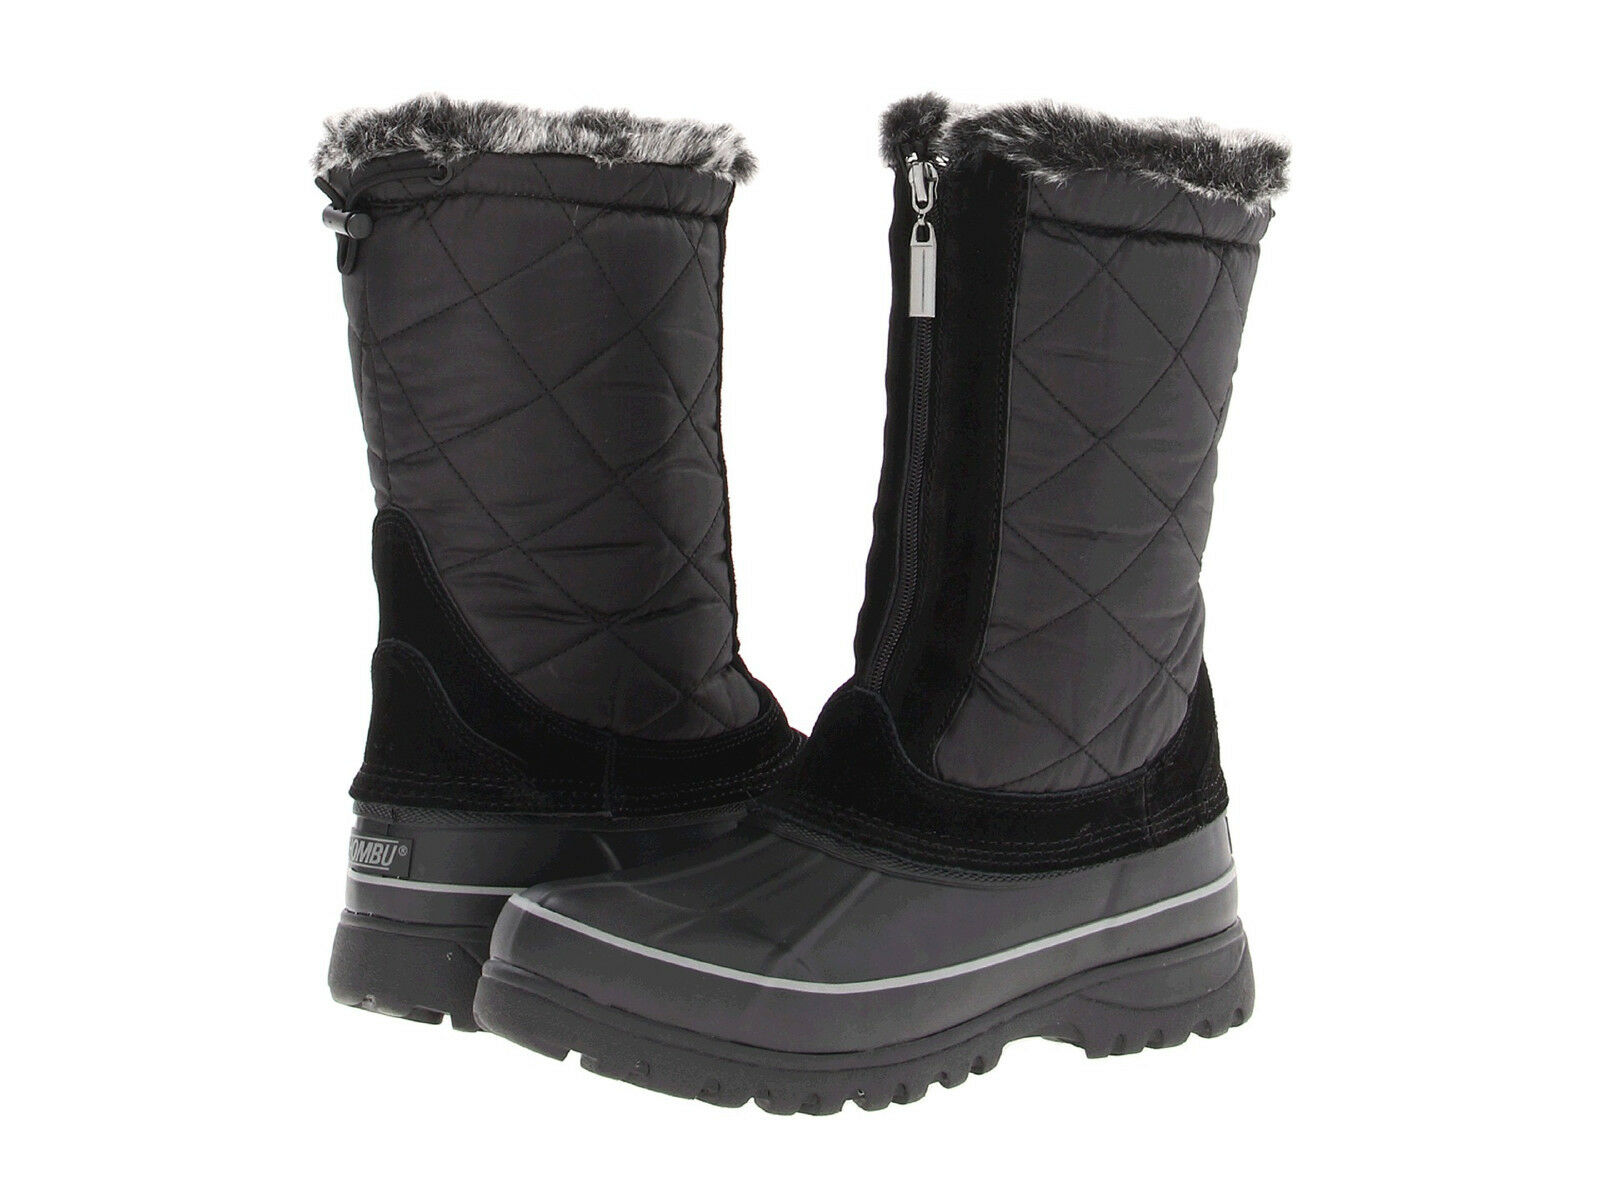 KHOMBU Women's Upland 2 Boot Black Weatherproof Winter Faux Fur NEW Zipper Nylon